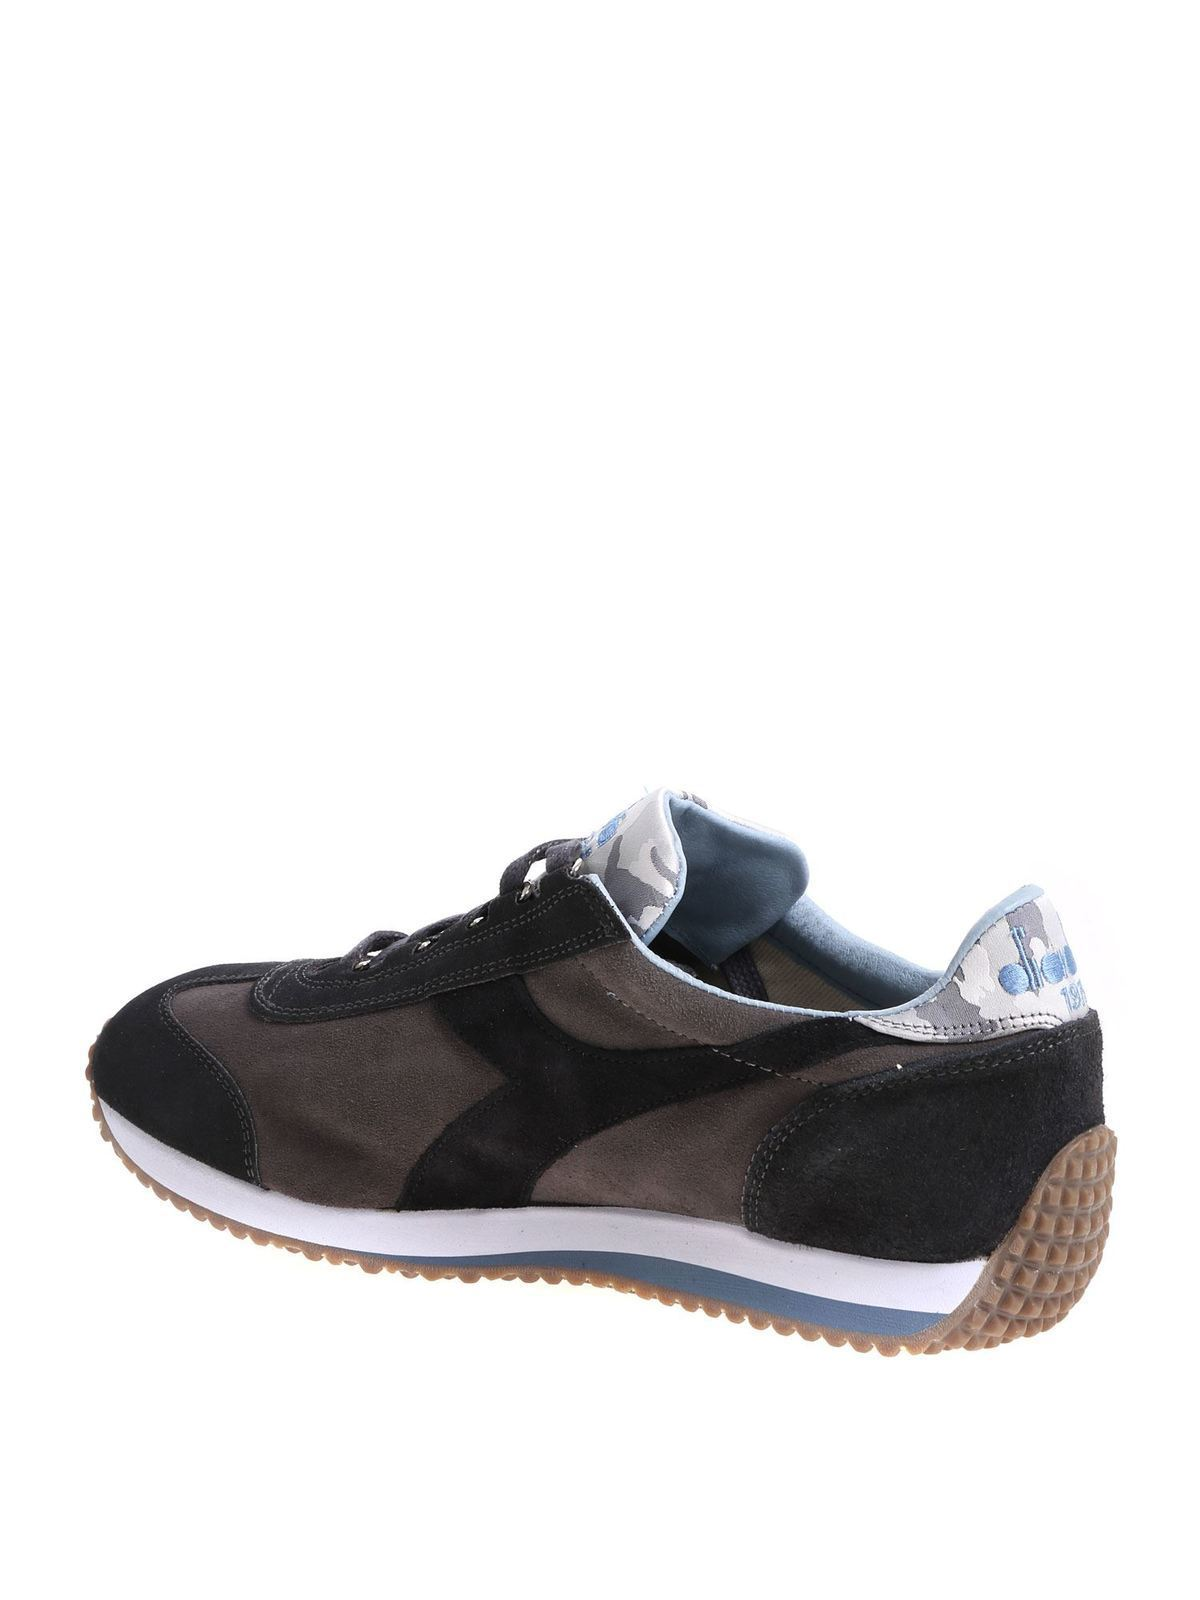 Diadora Heritage Sneaker Evo Camo antracite sneakers